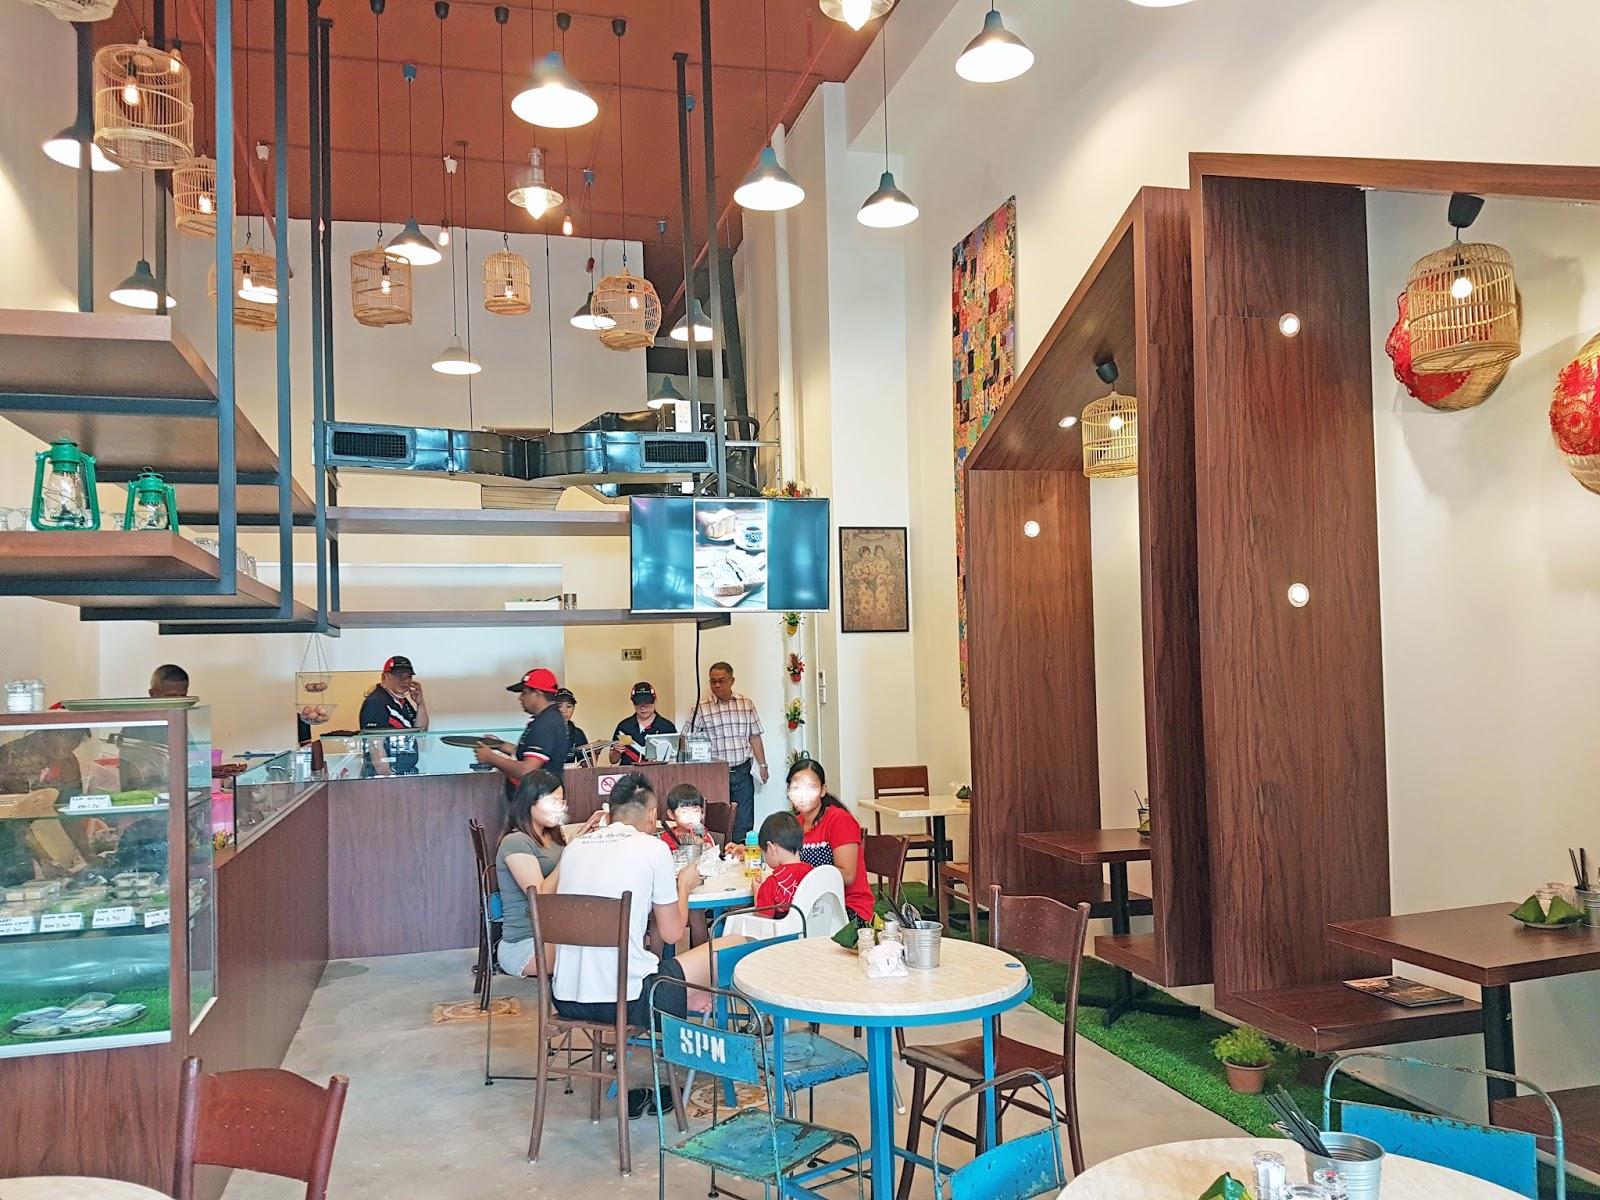 Lao Jie Fang Coffee Terrace 老街坊咖啡苑 @ Sunrise Gurney, Penang